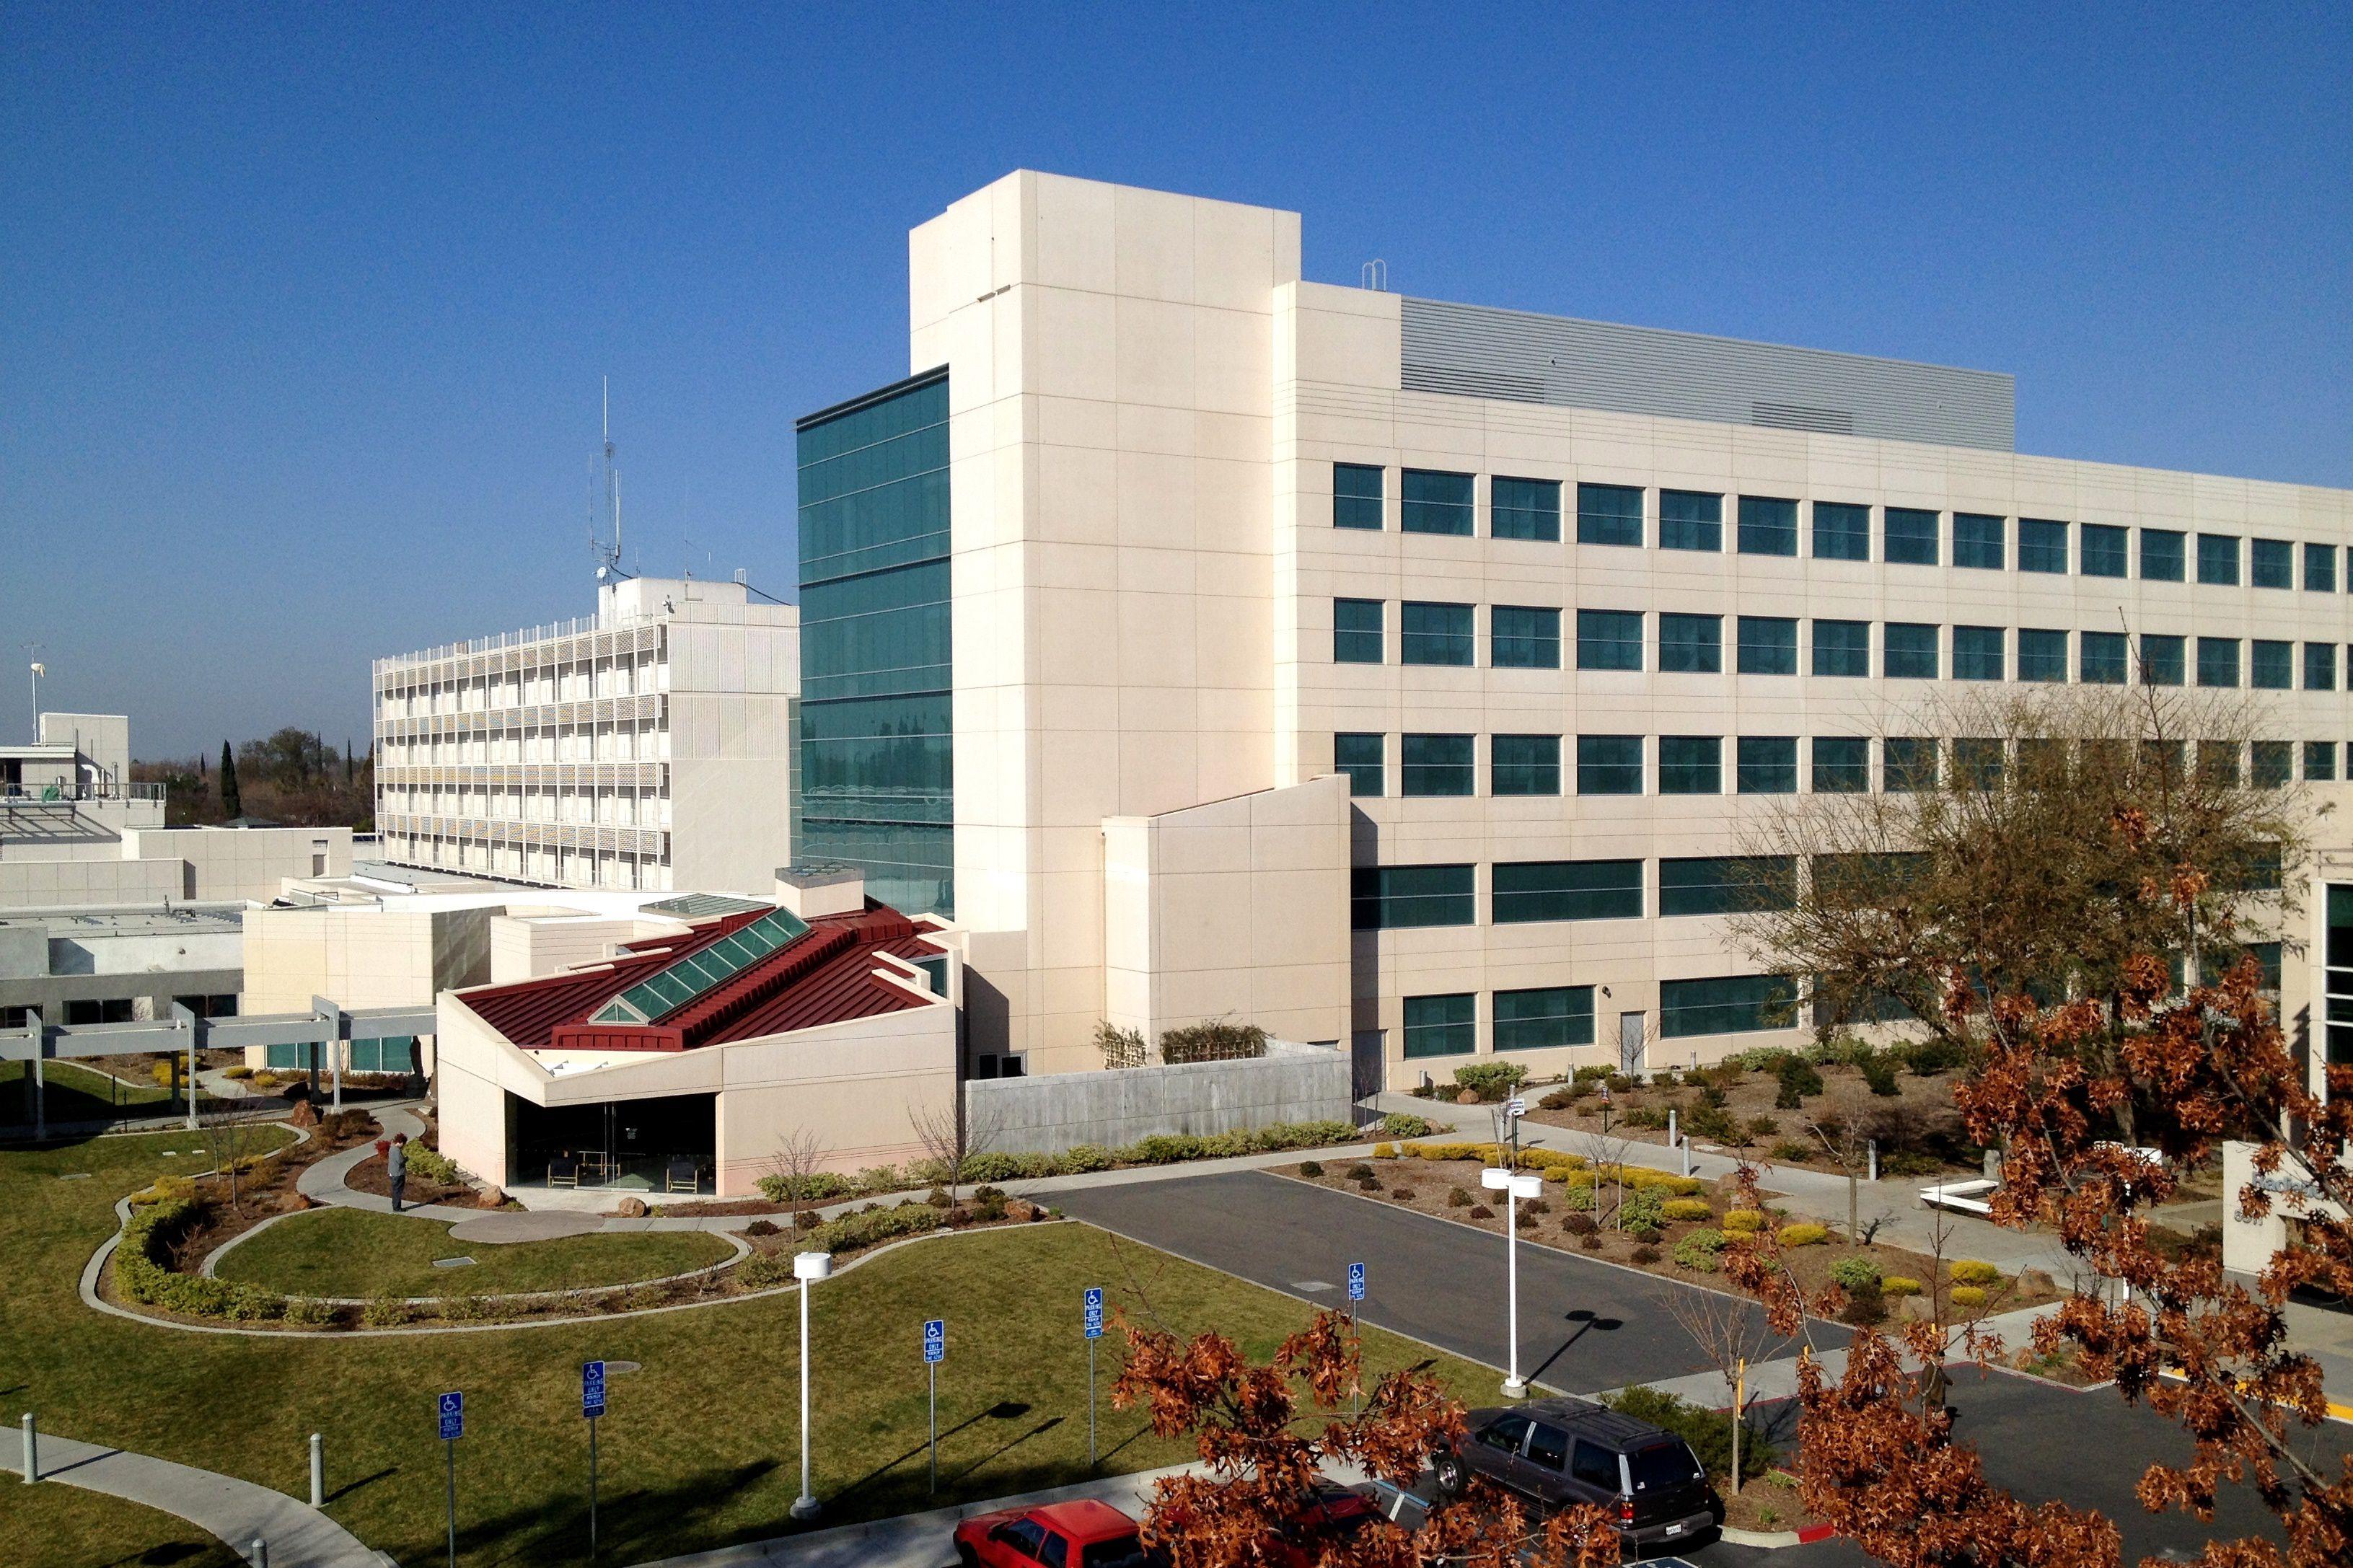 Mercy San Juan Medical Center in Carmichael, California